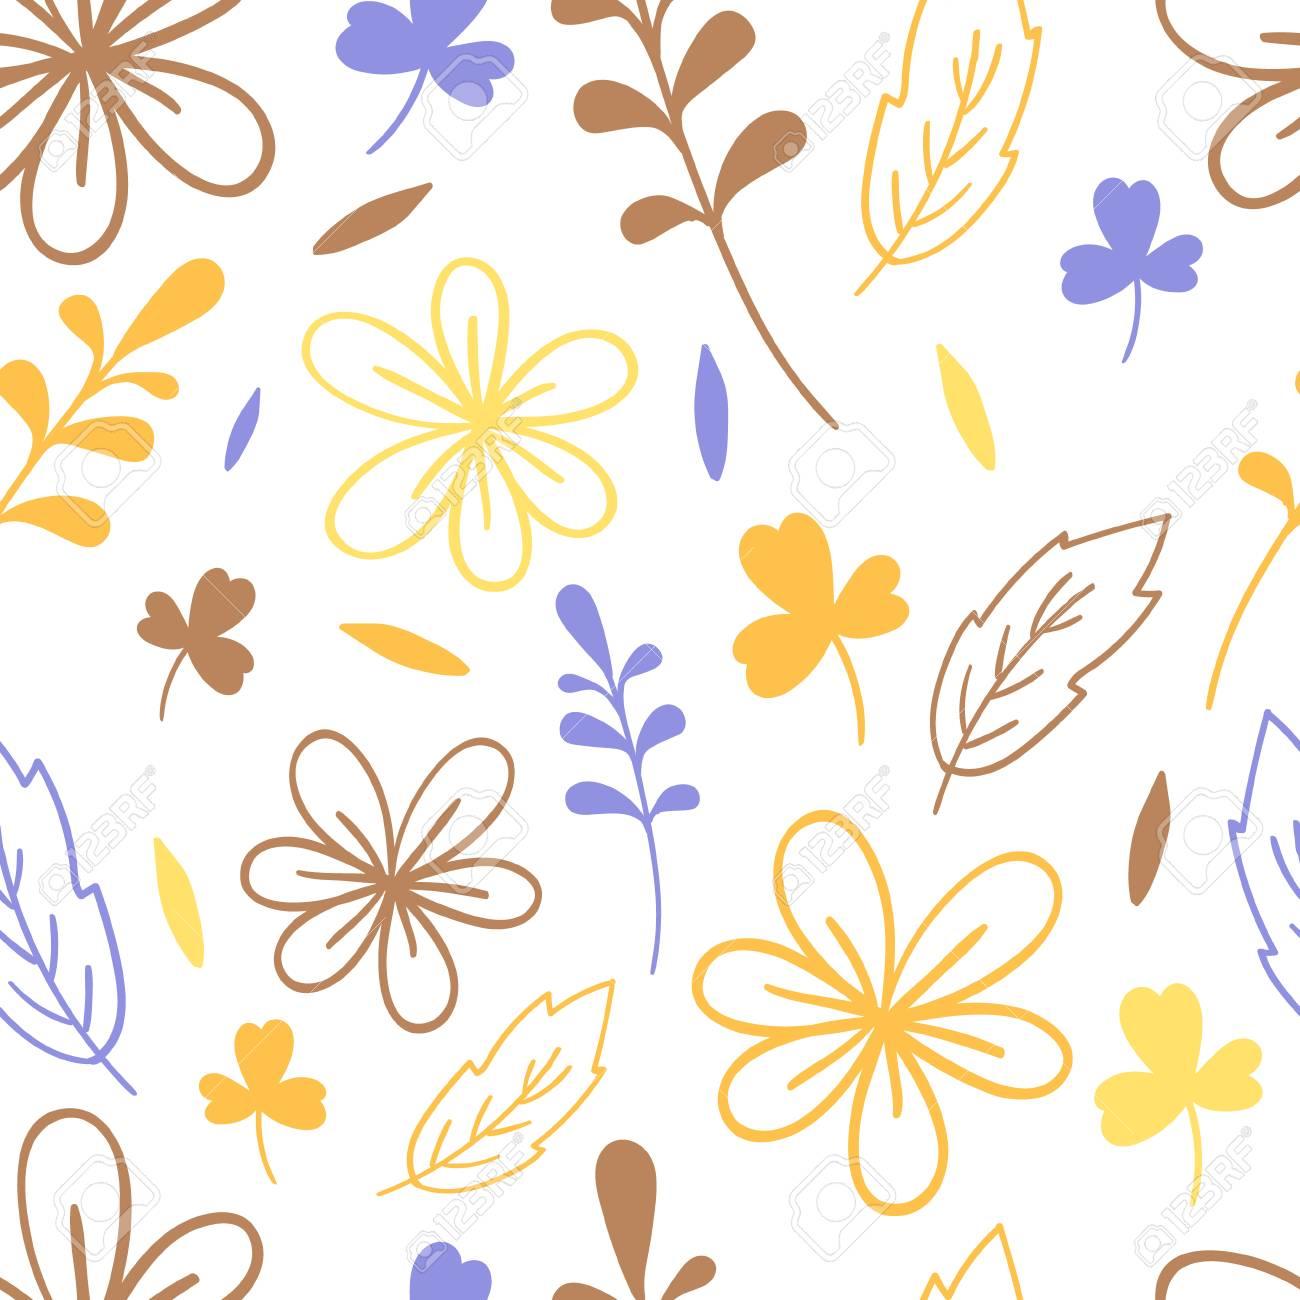 Seamless simplicity floral pattern. Elegant vector illustration. For print, card - 97072461